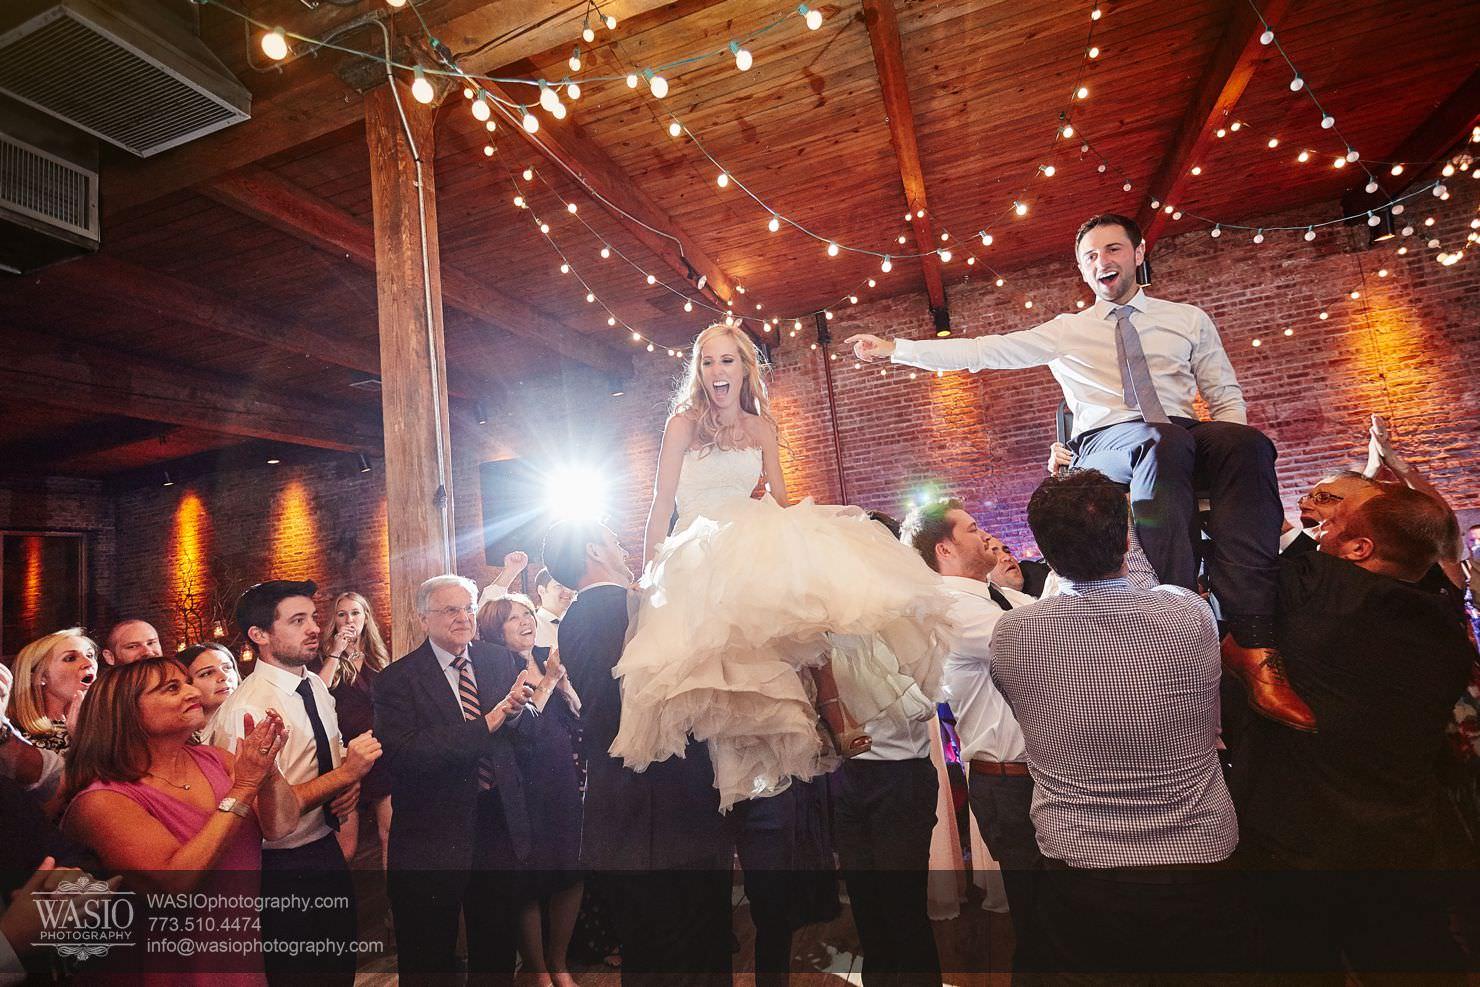 39_Chicago-Gallery-Wedding_3P4C2304-1 Chicago Gallery Wedding - Courtney + Danny